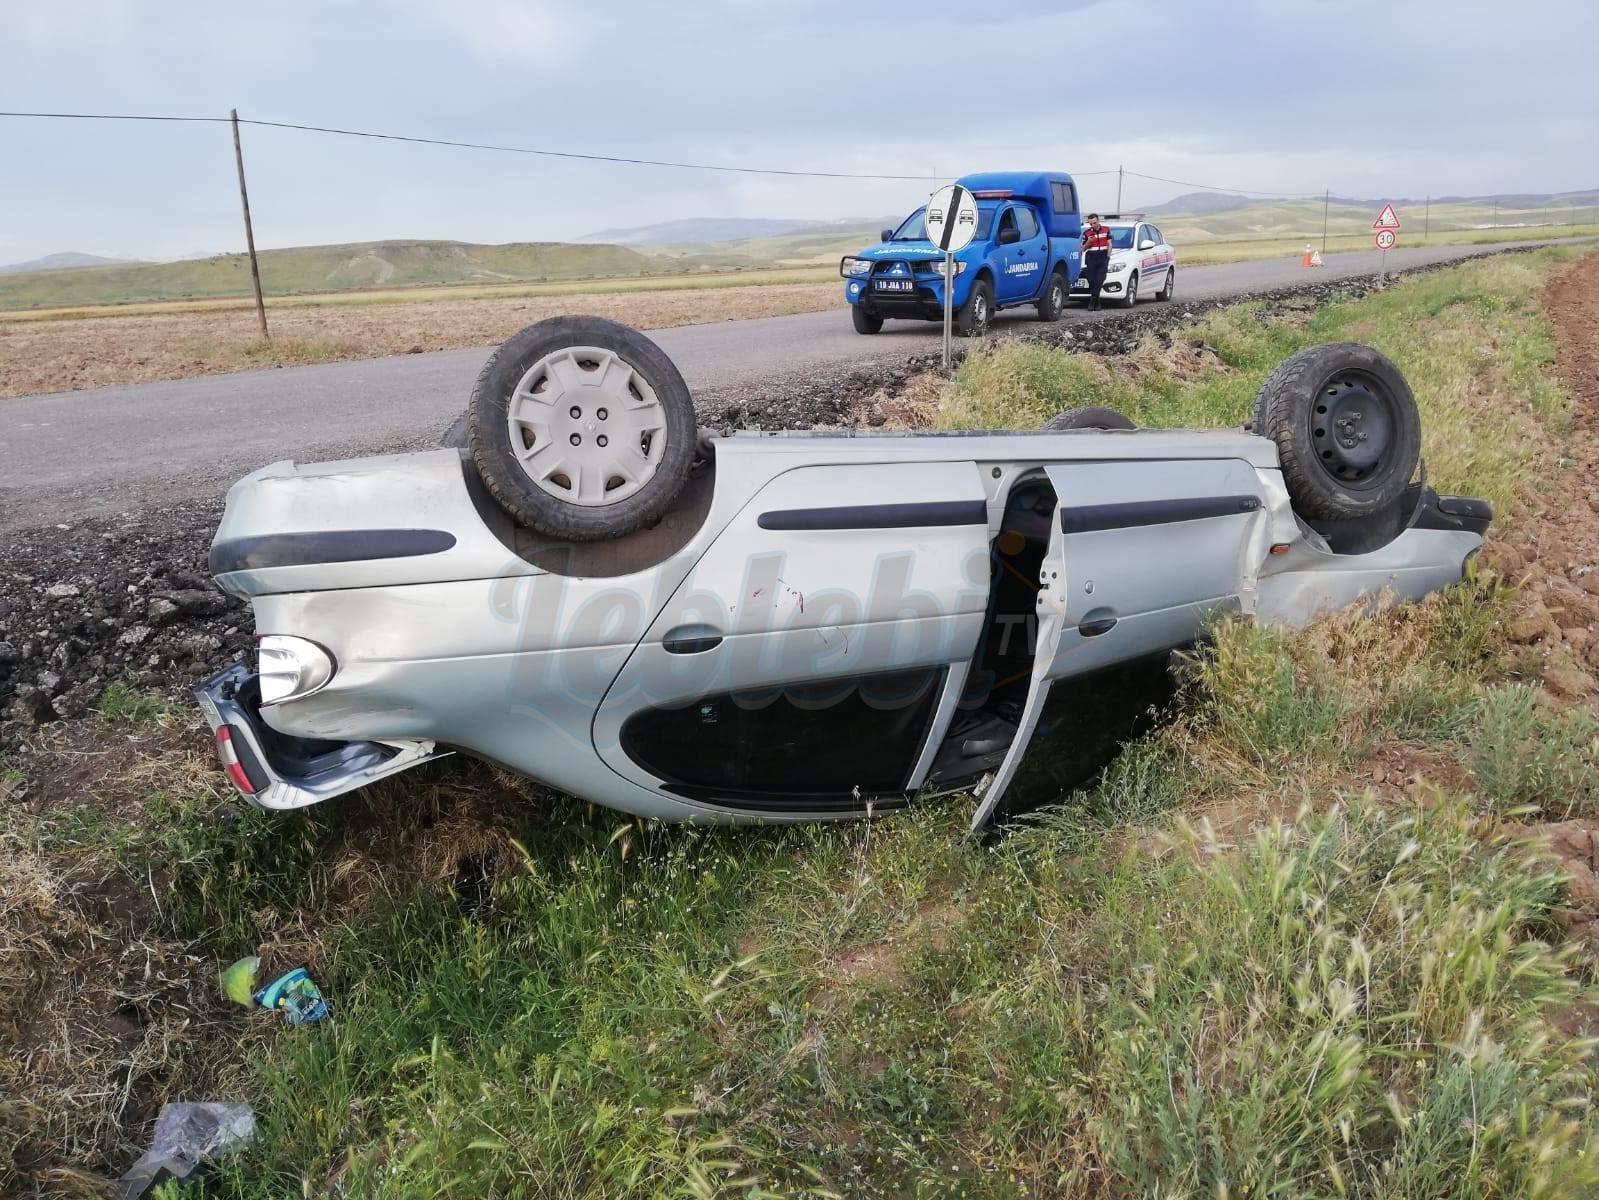 Mıcıra Kapılan Otomobil Takla Attı